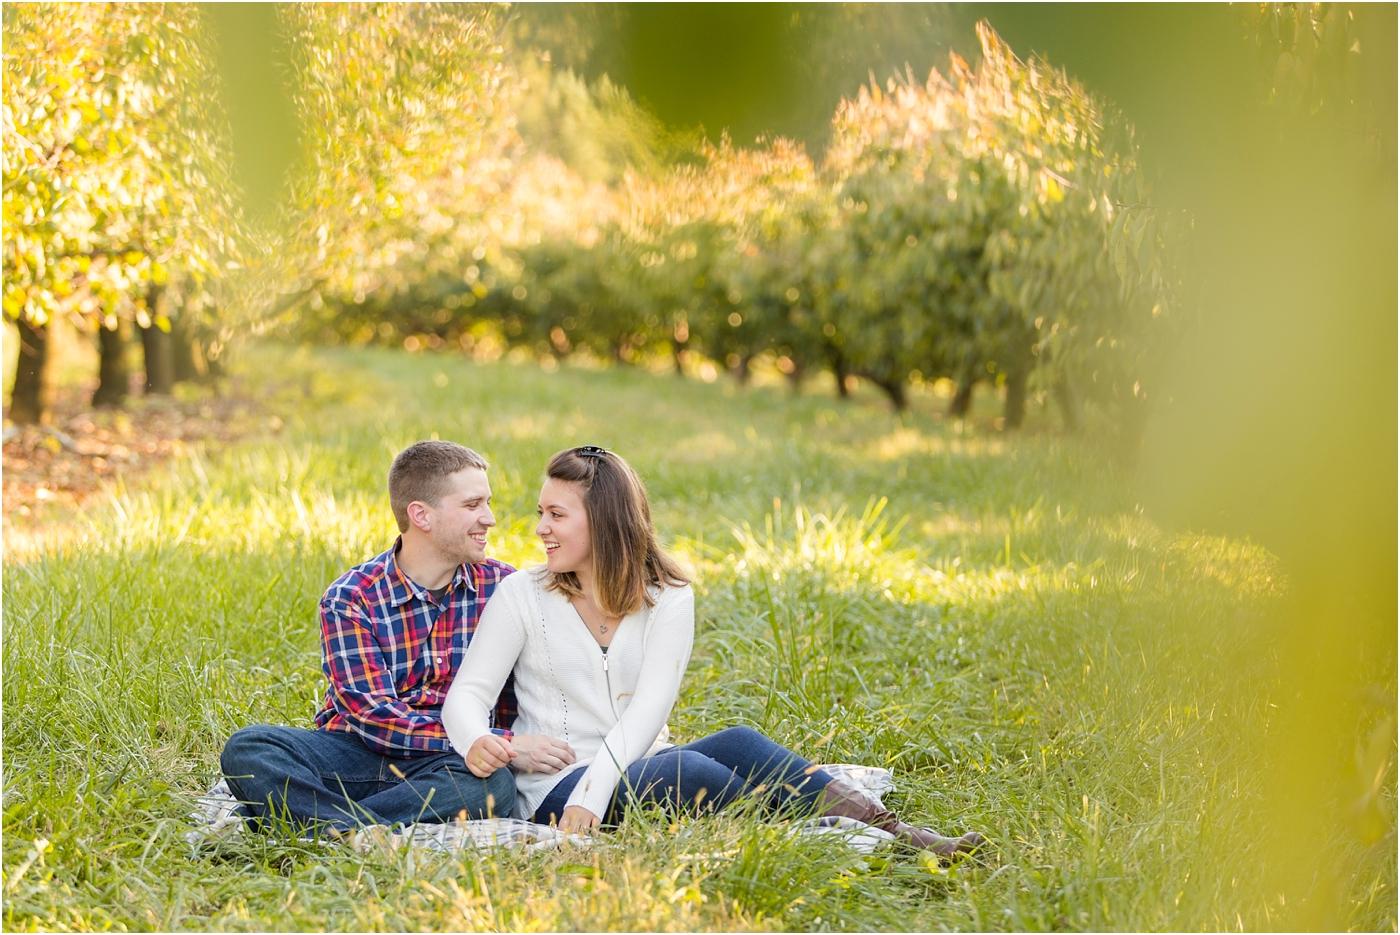 Larriland-Farm-Engagement-Photo_0009.jpg